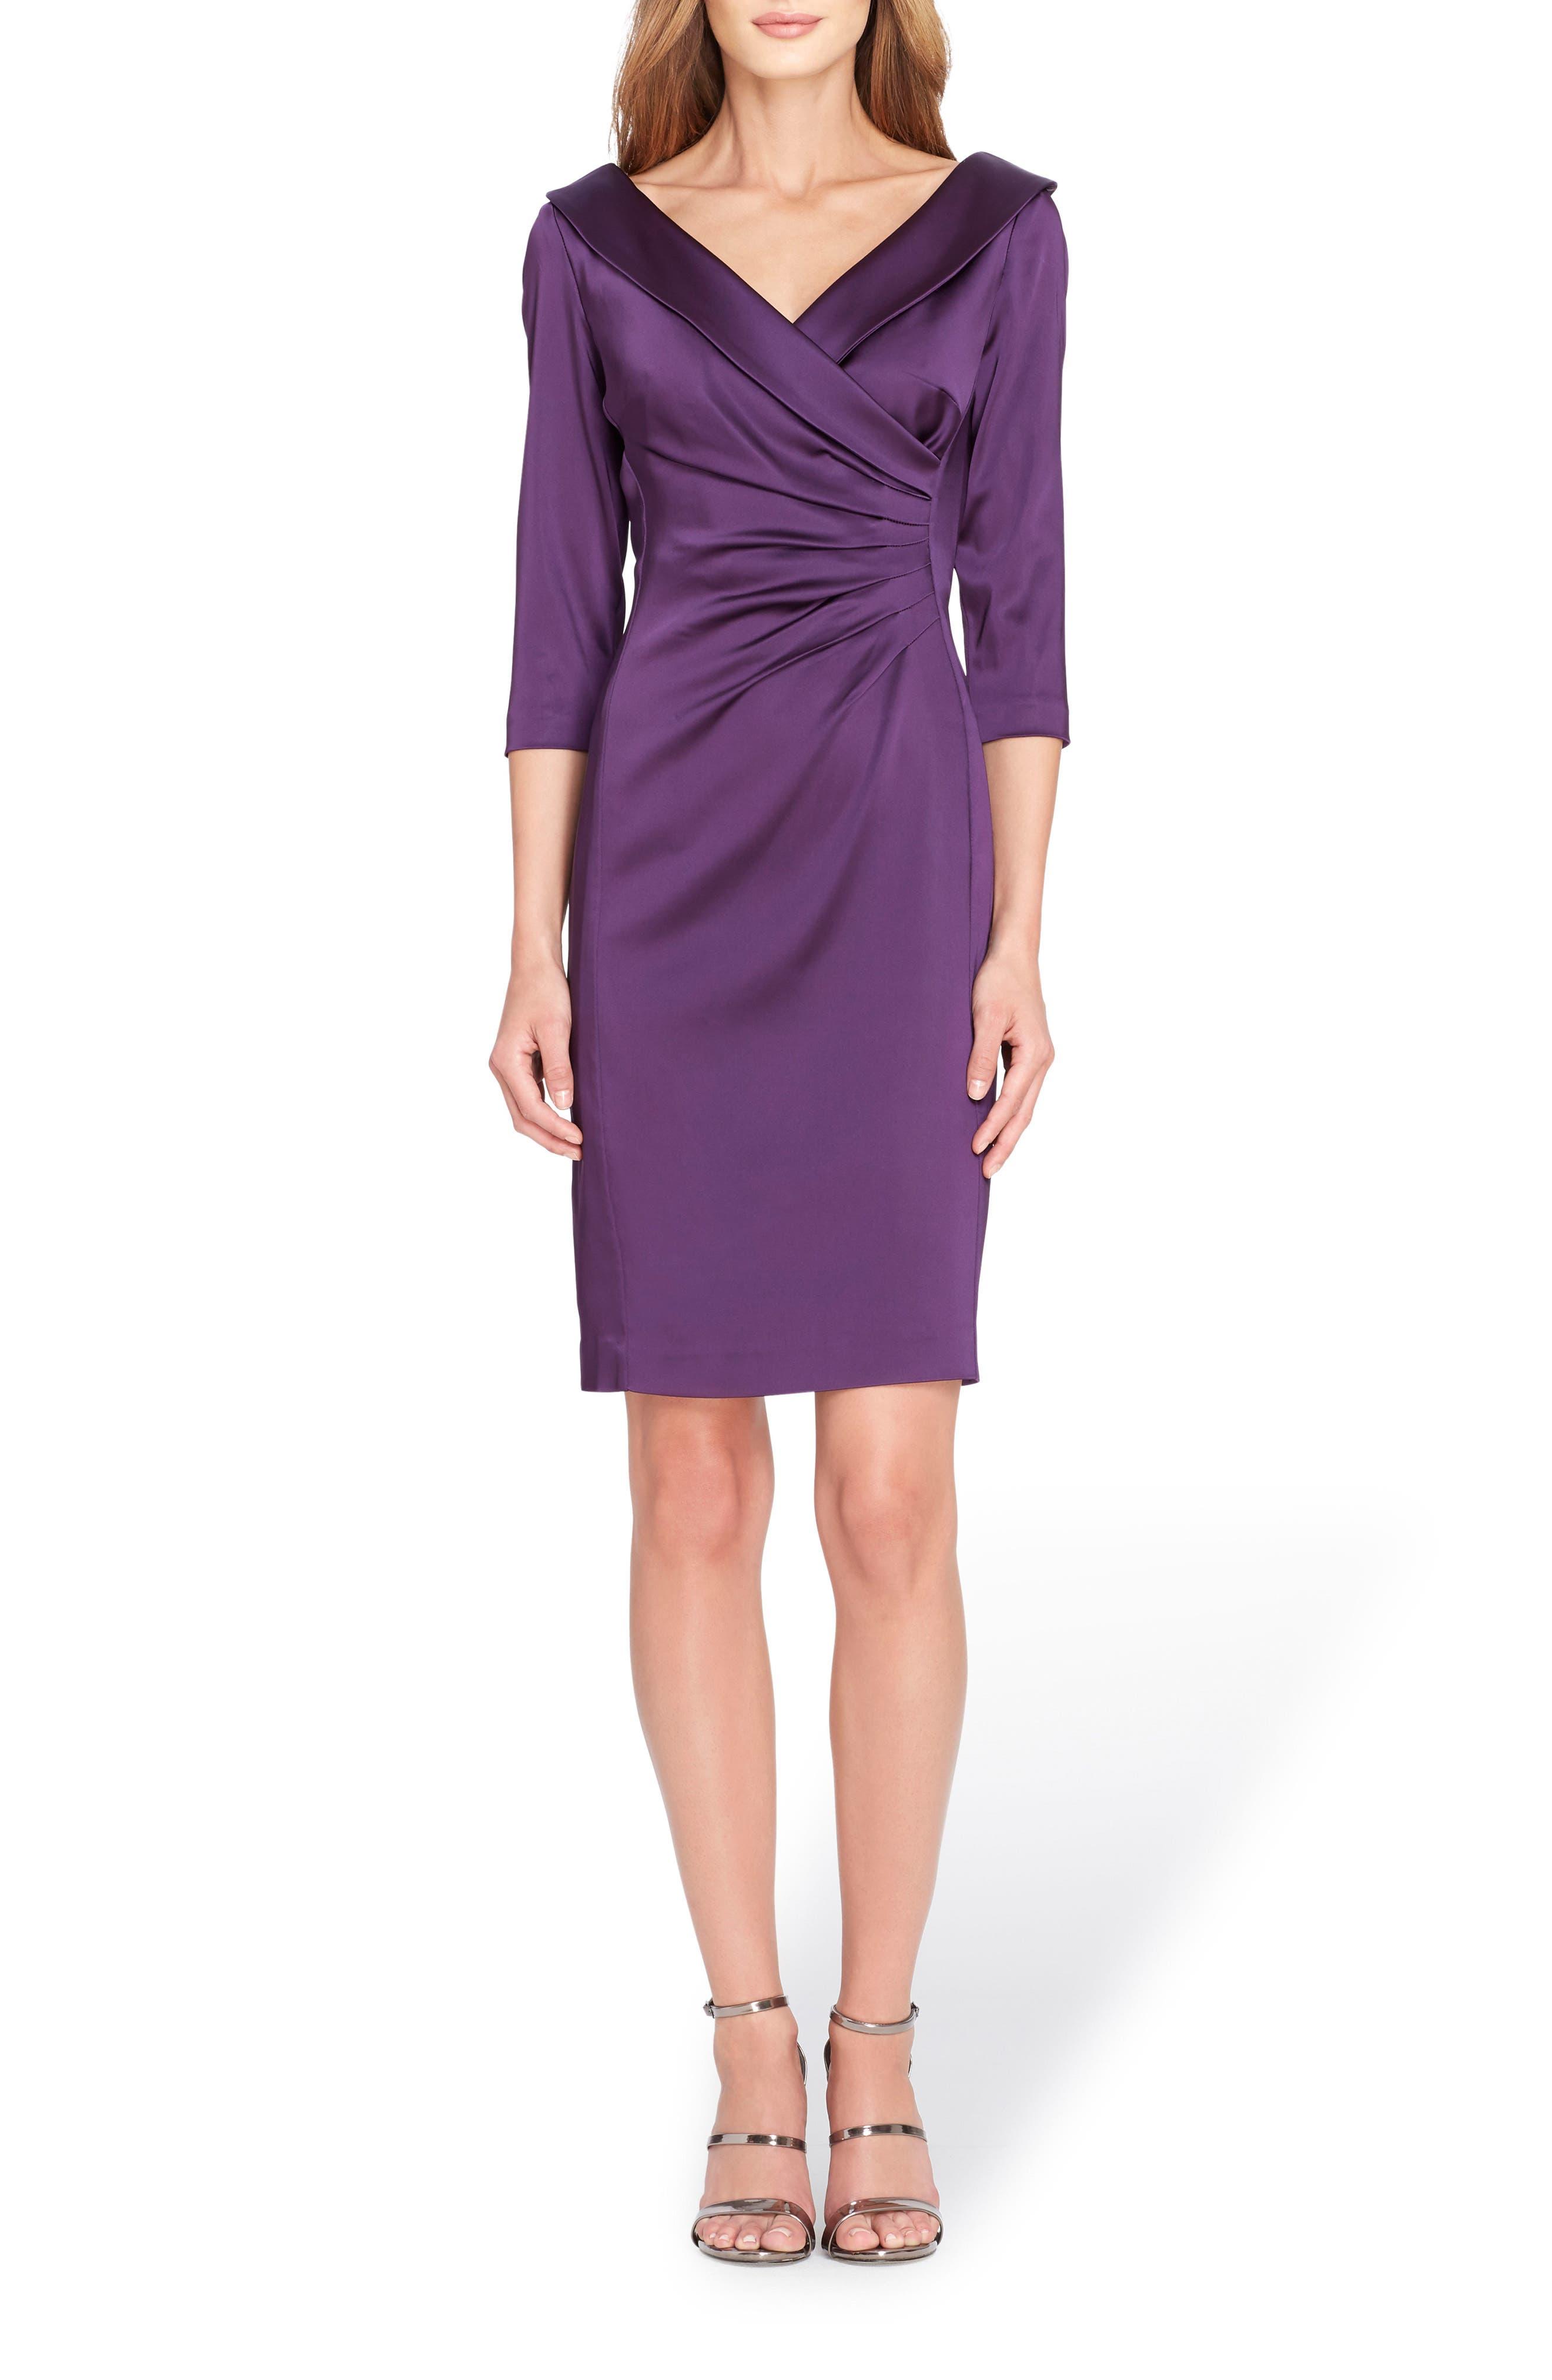 Ruched Stretch Satin Sheath Dress,                             Main thumbnail 1, color,                             Plum